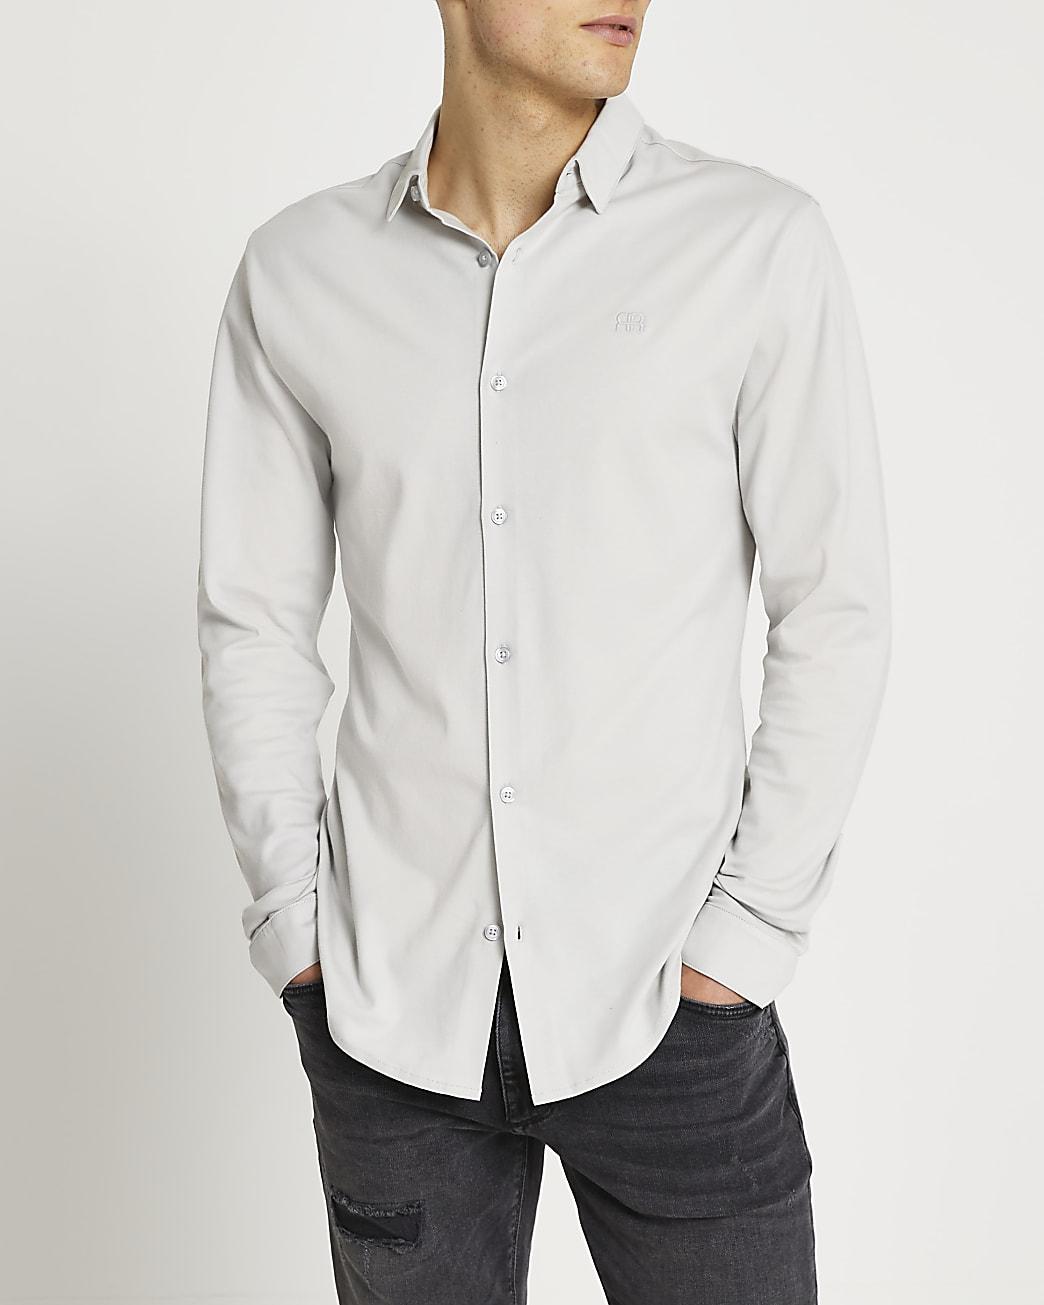 Grey marl RR muscle fit long sleeve shirt